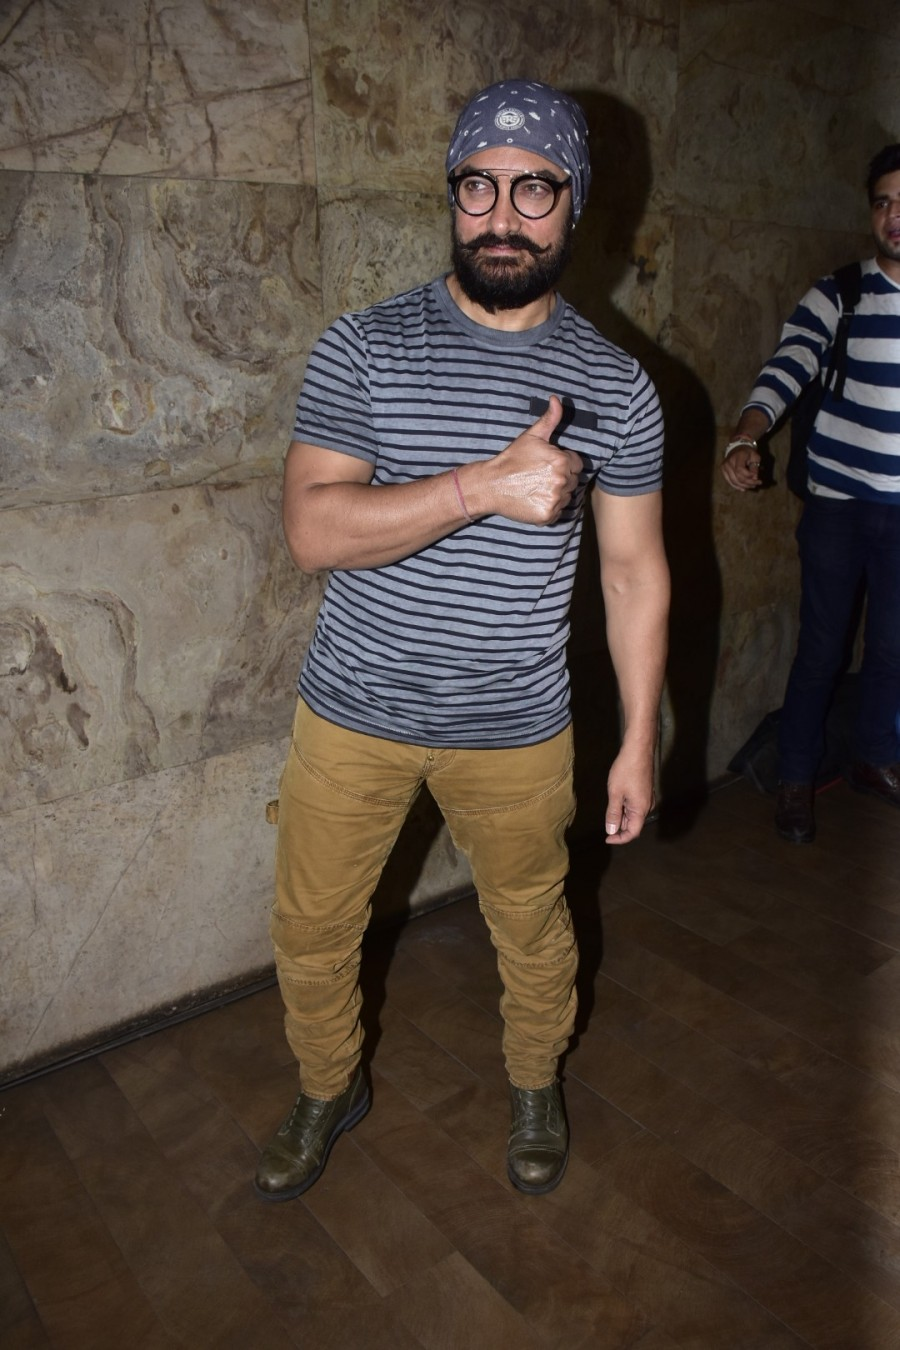 Aamir Khan,Aamir Khan  from 97 kgs to six packs,Aamir Khan six packs,Aamir Khan's six packs,Aamir Khan's body transformation,Aamir Khan body transformation,Mahavir Singh Phogat